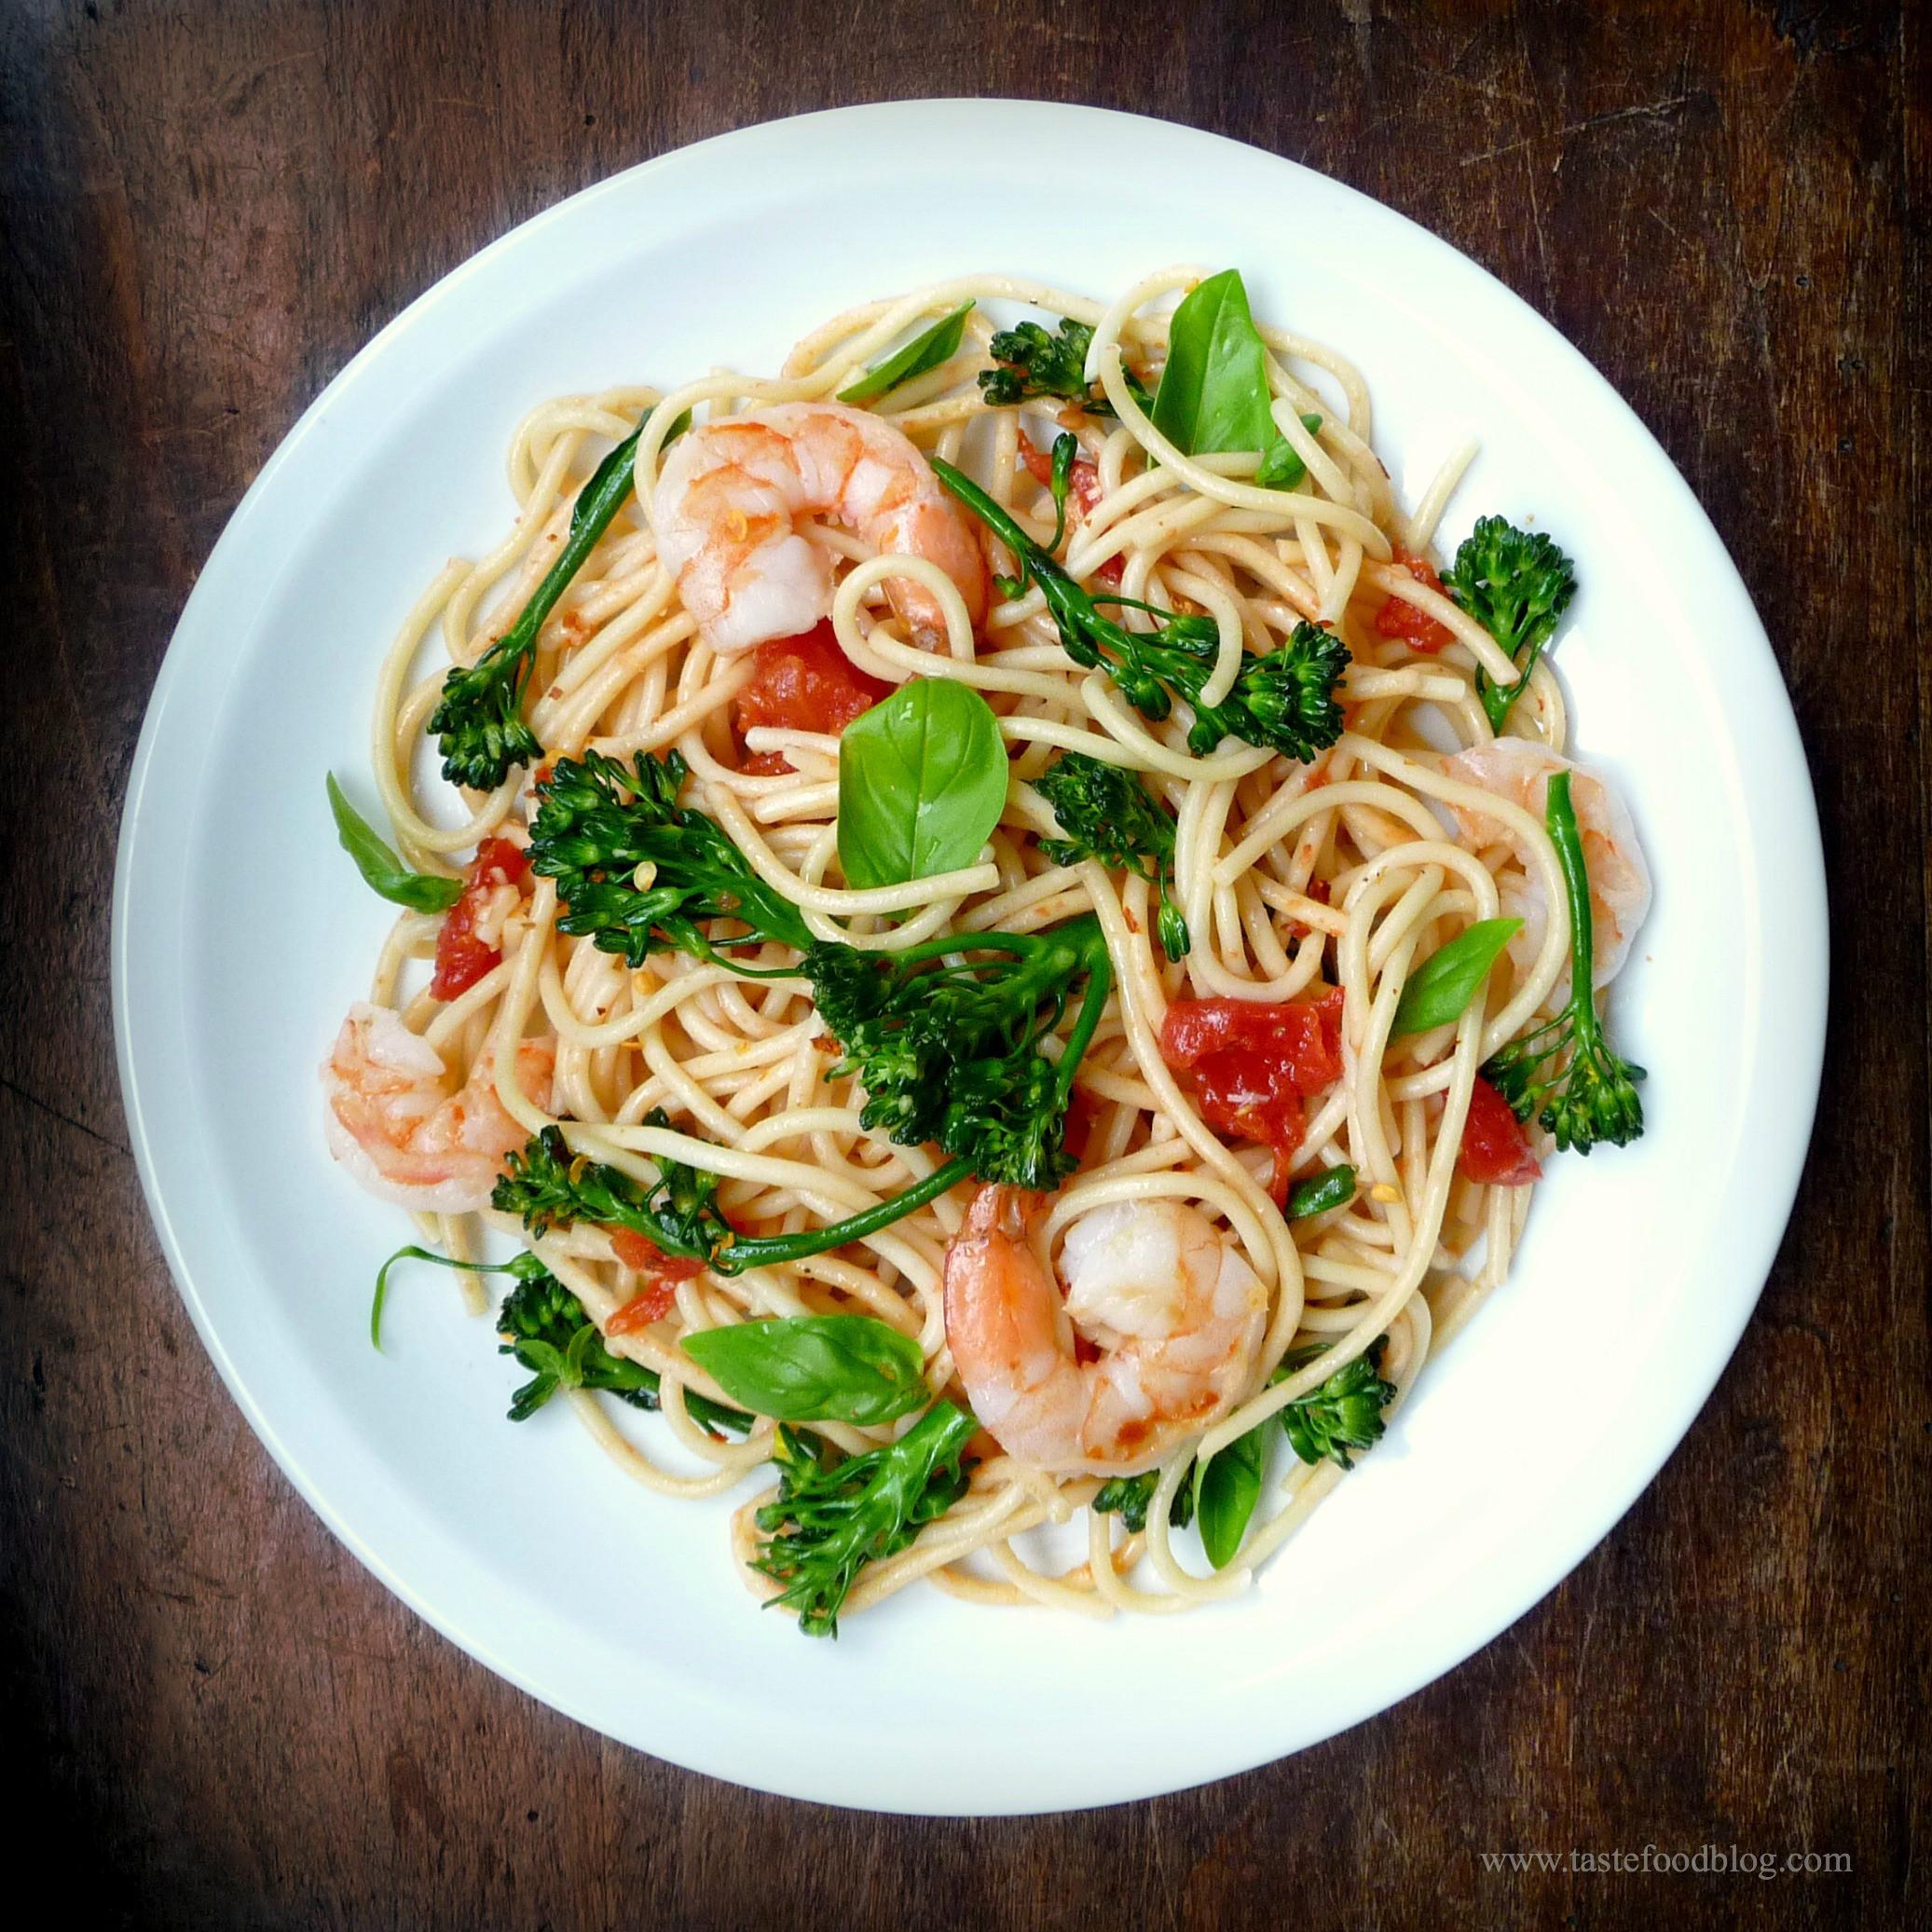 Shrimp Broccoli Pasta  Shrimp Broccolini and Tomato Pasta – TasteFood